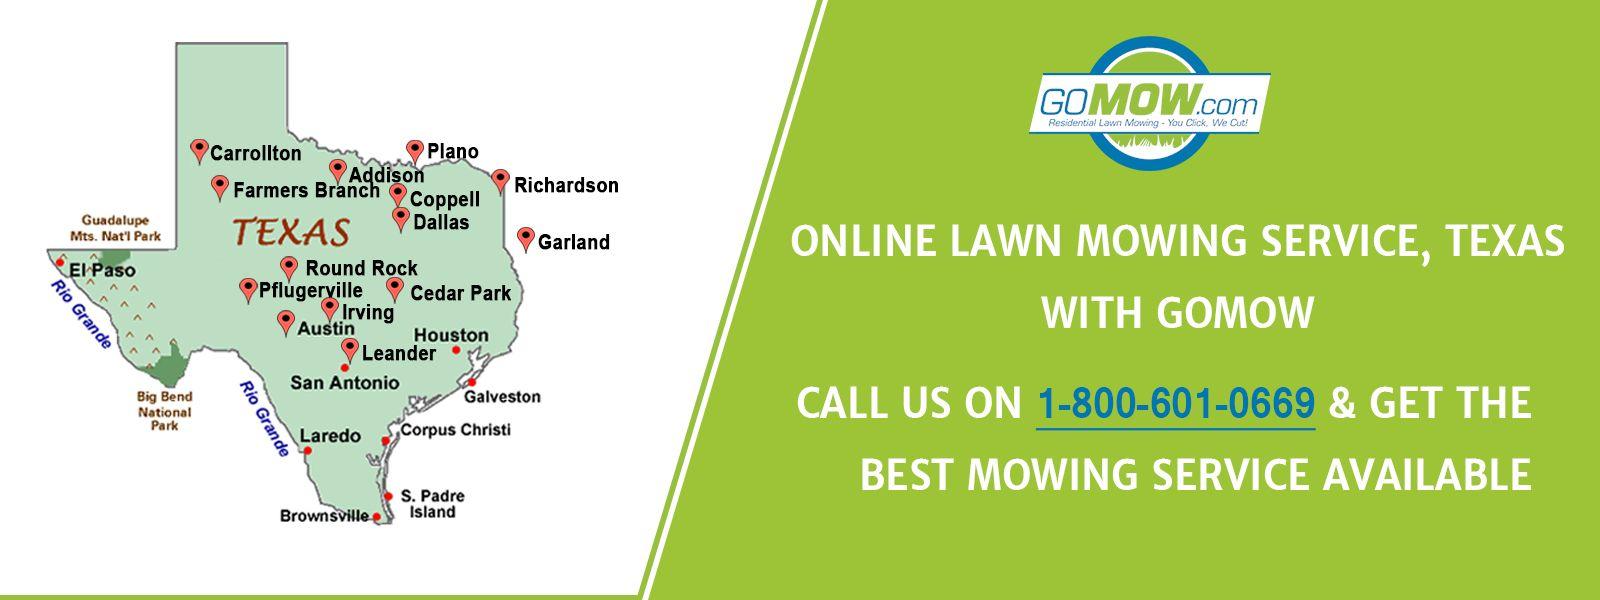 Premier Lawn Care & Maintenance Service Areas in TX, Lawn